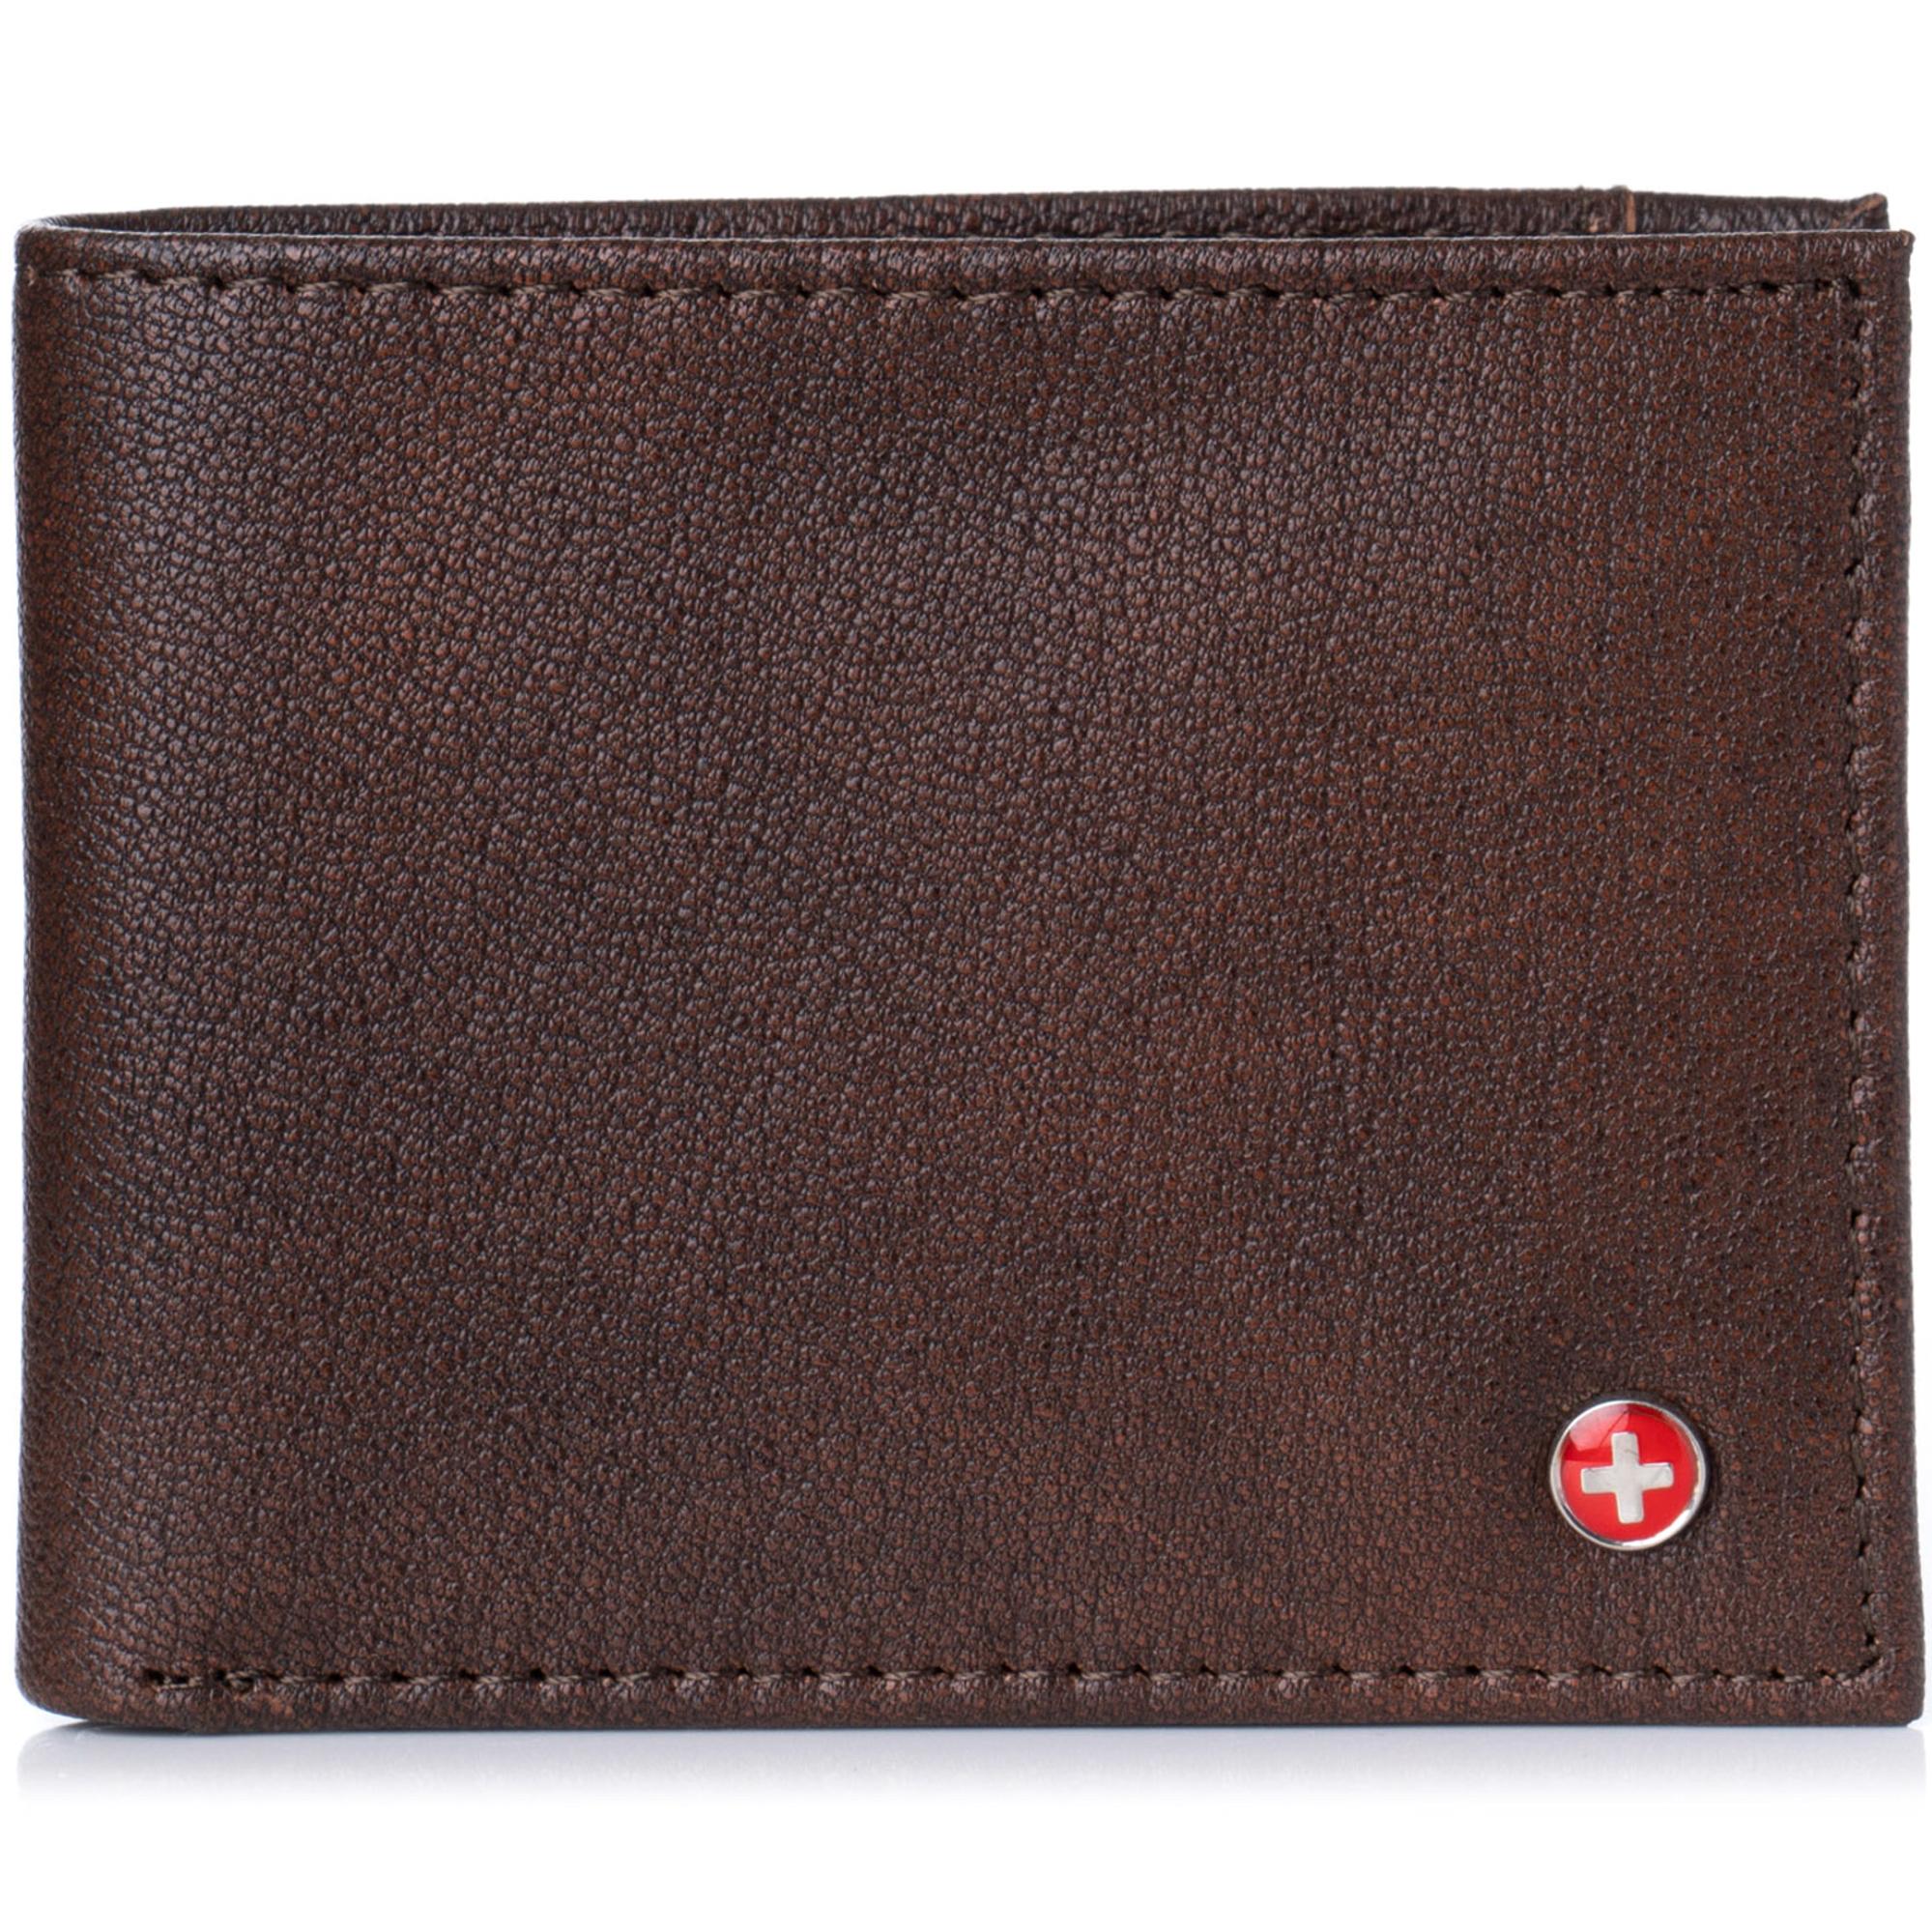 Alpine-Swiss-Mens-Thin-Bifold-Wallet-Top-Grain-Leather-EZ-Access-Outer-Card-Slot thumbnail 14